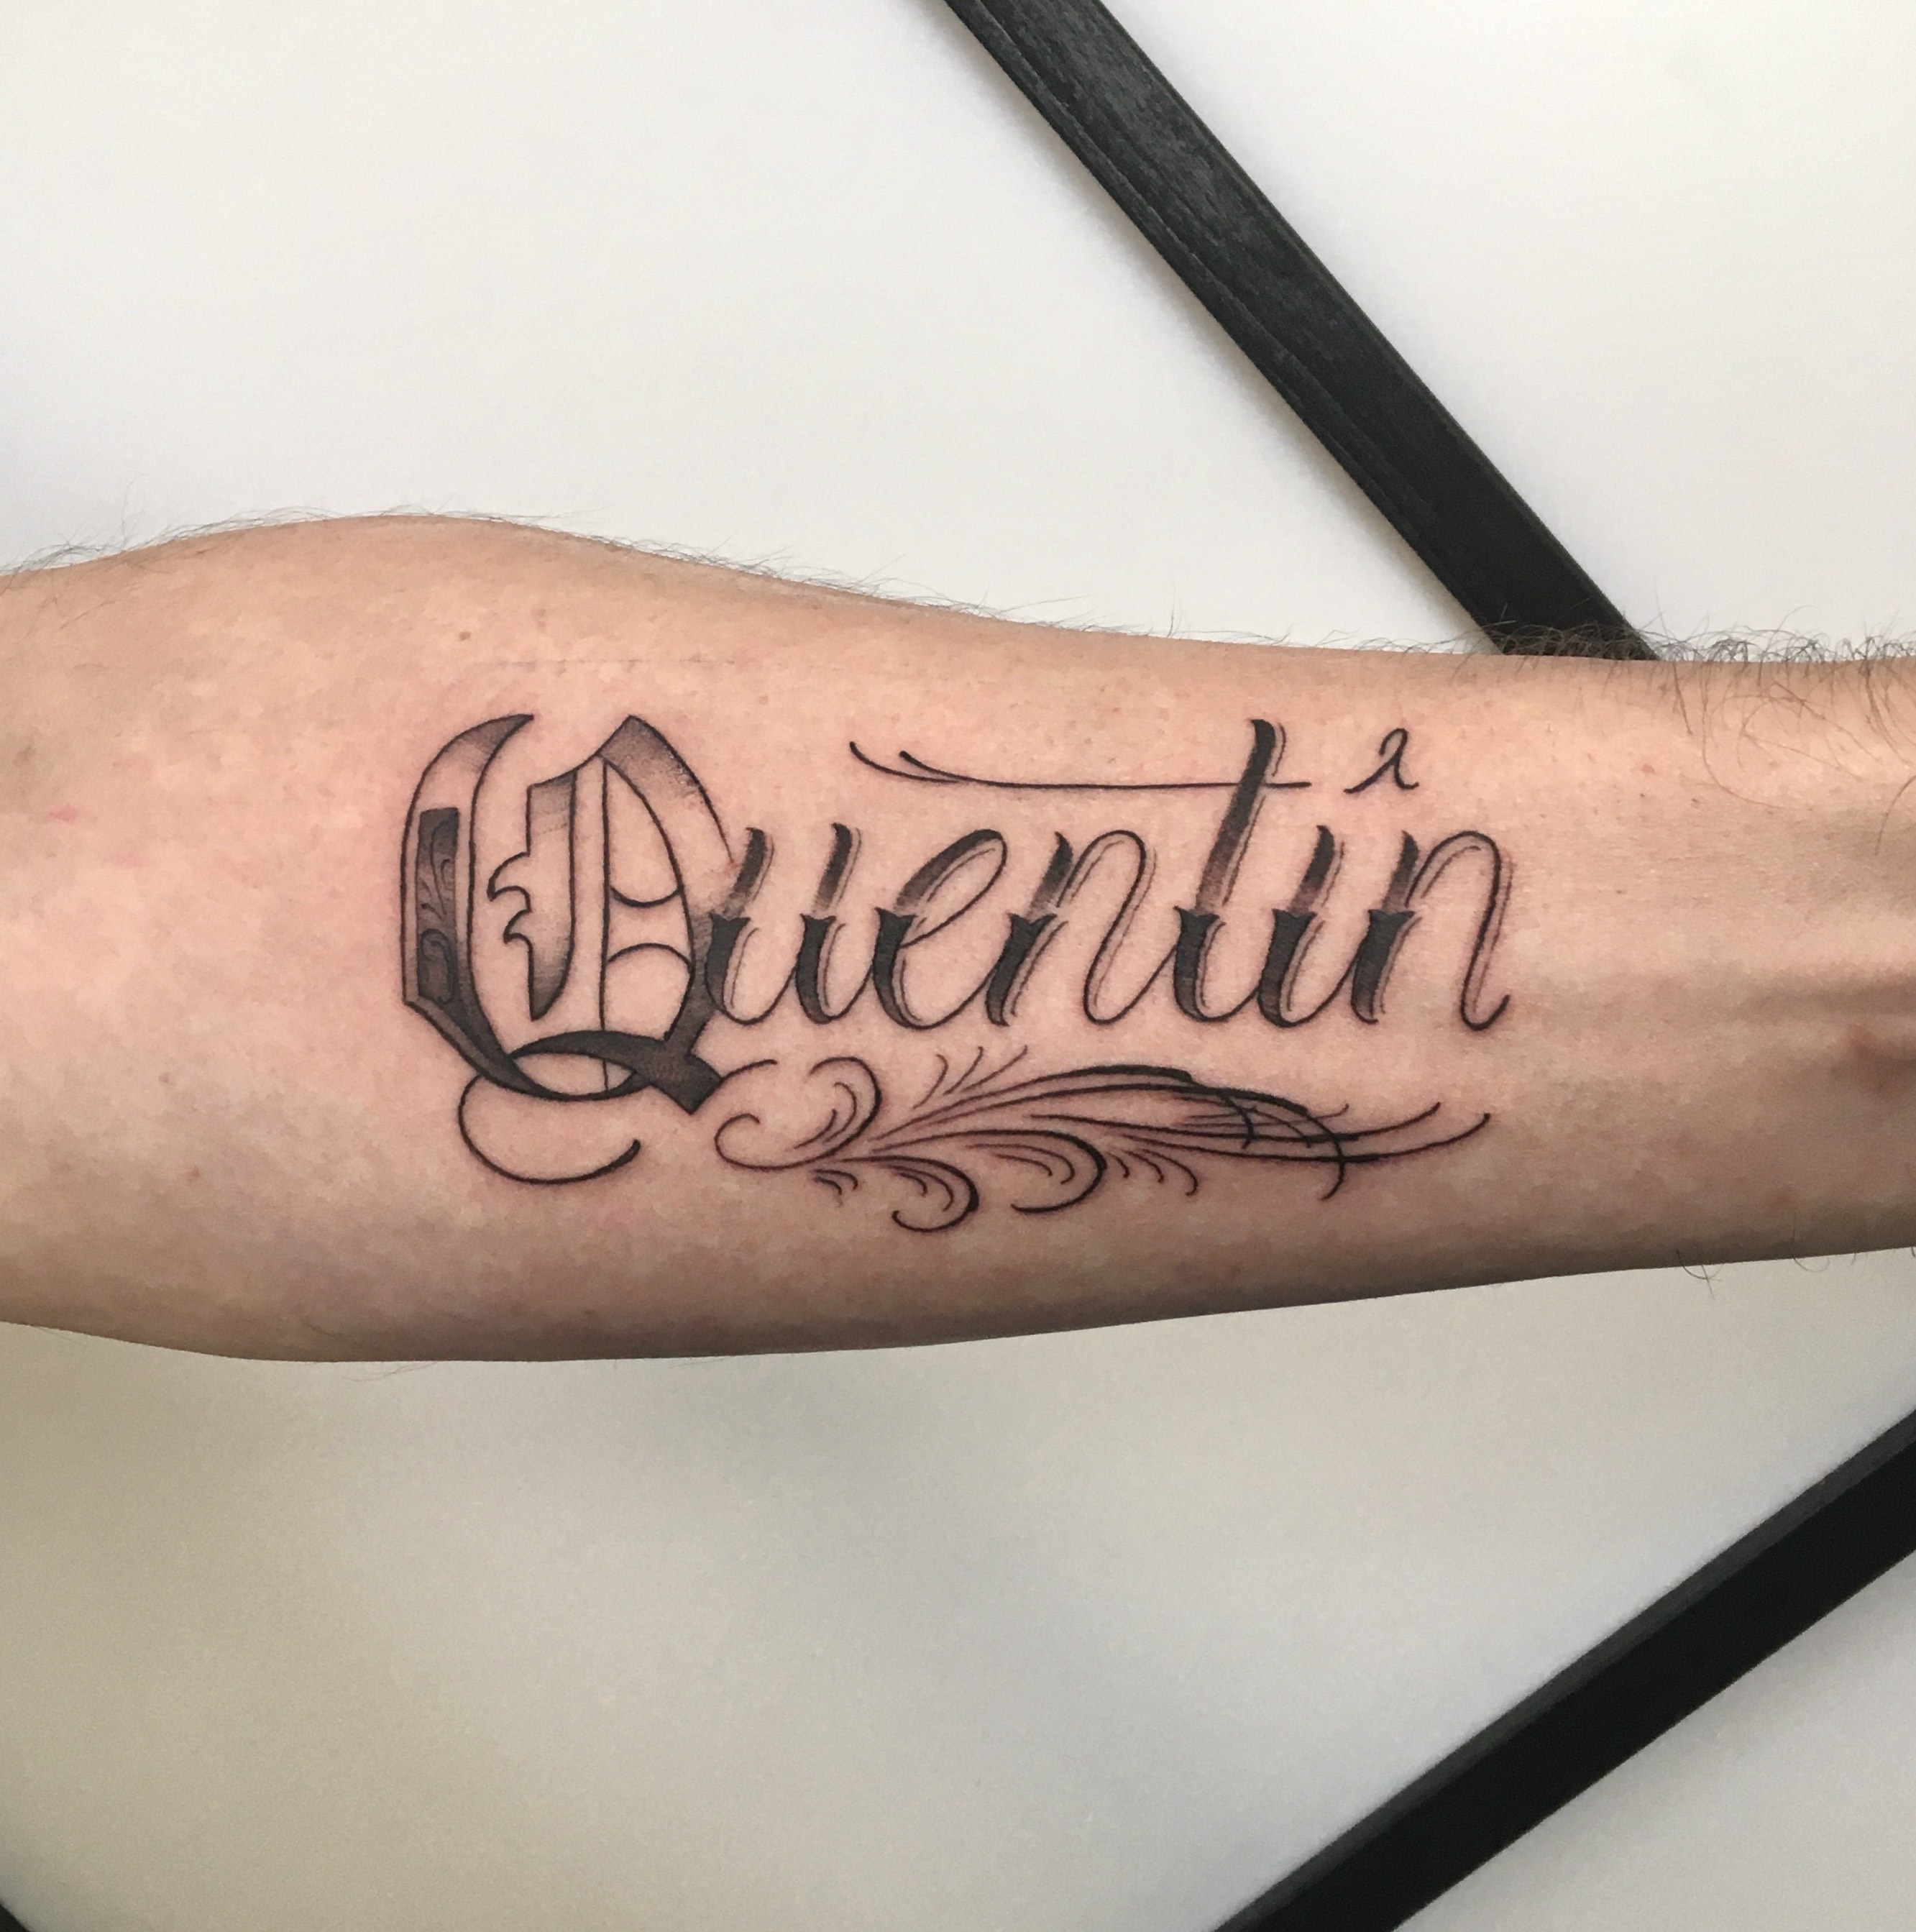 maxime-lamache-tattoo-angouleme-valere-tattoo-5